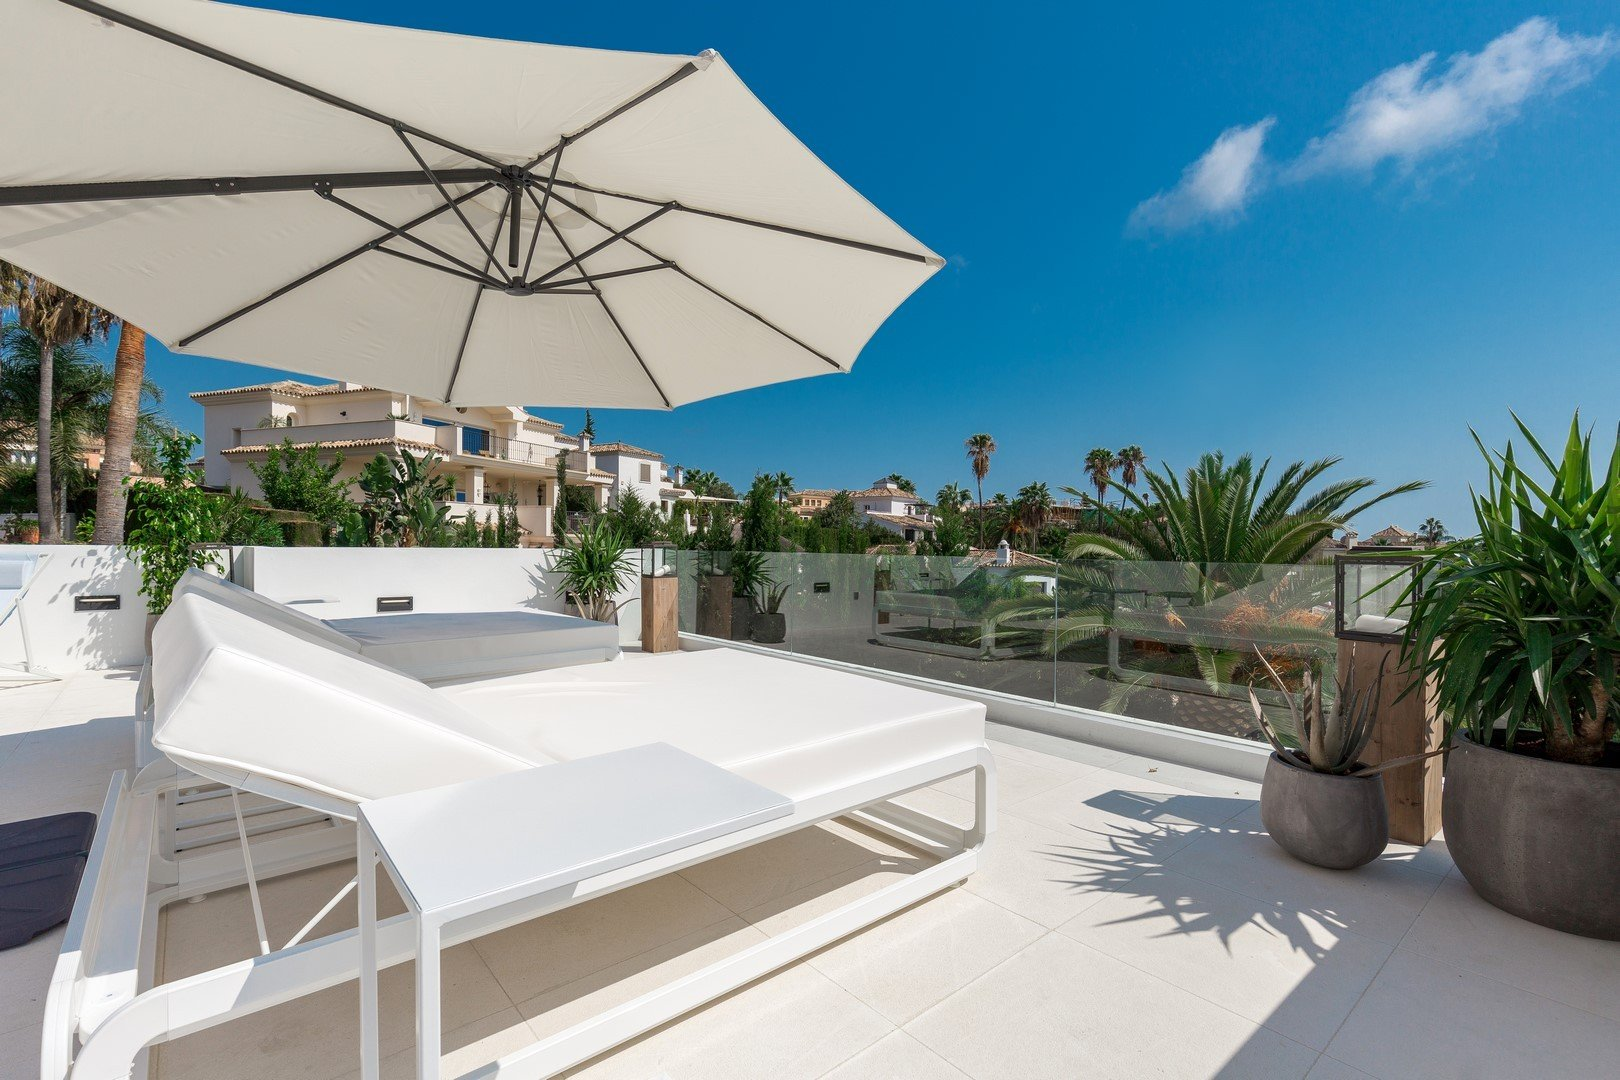 aaa5 Комнатный Дом в Nueva Andalucia, Marbella | M314891